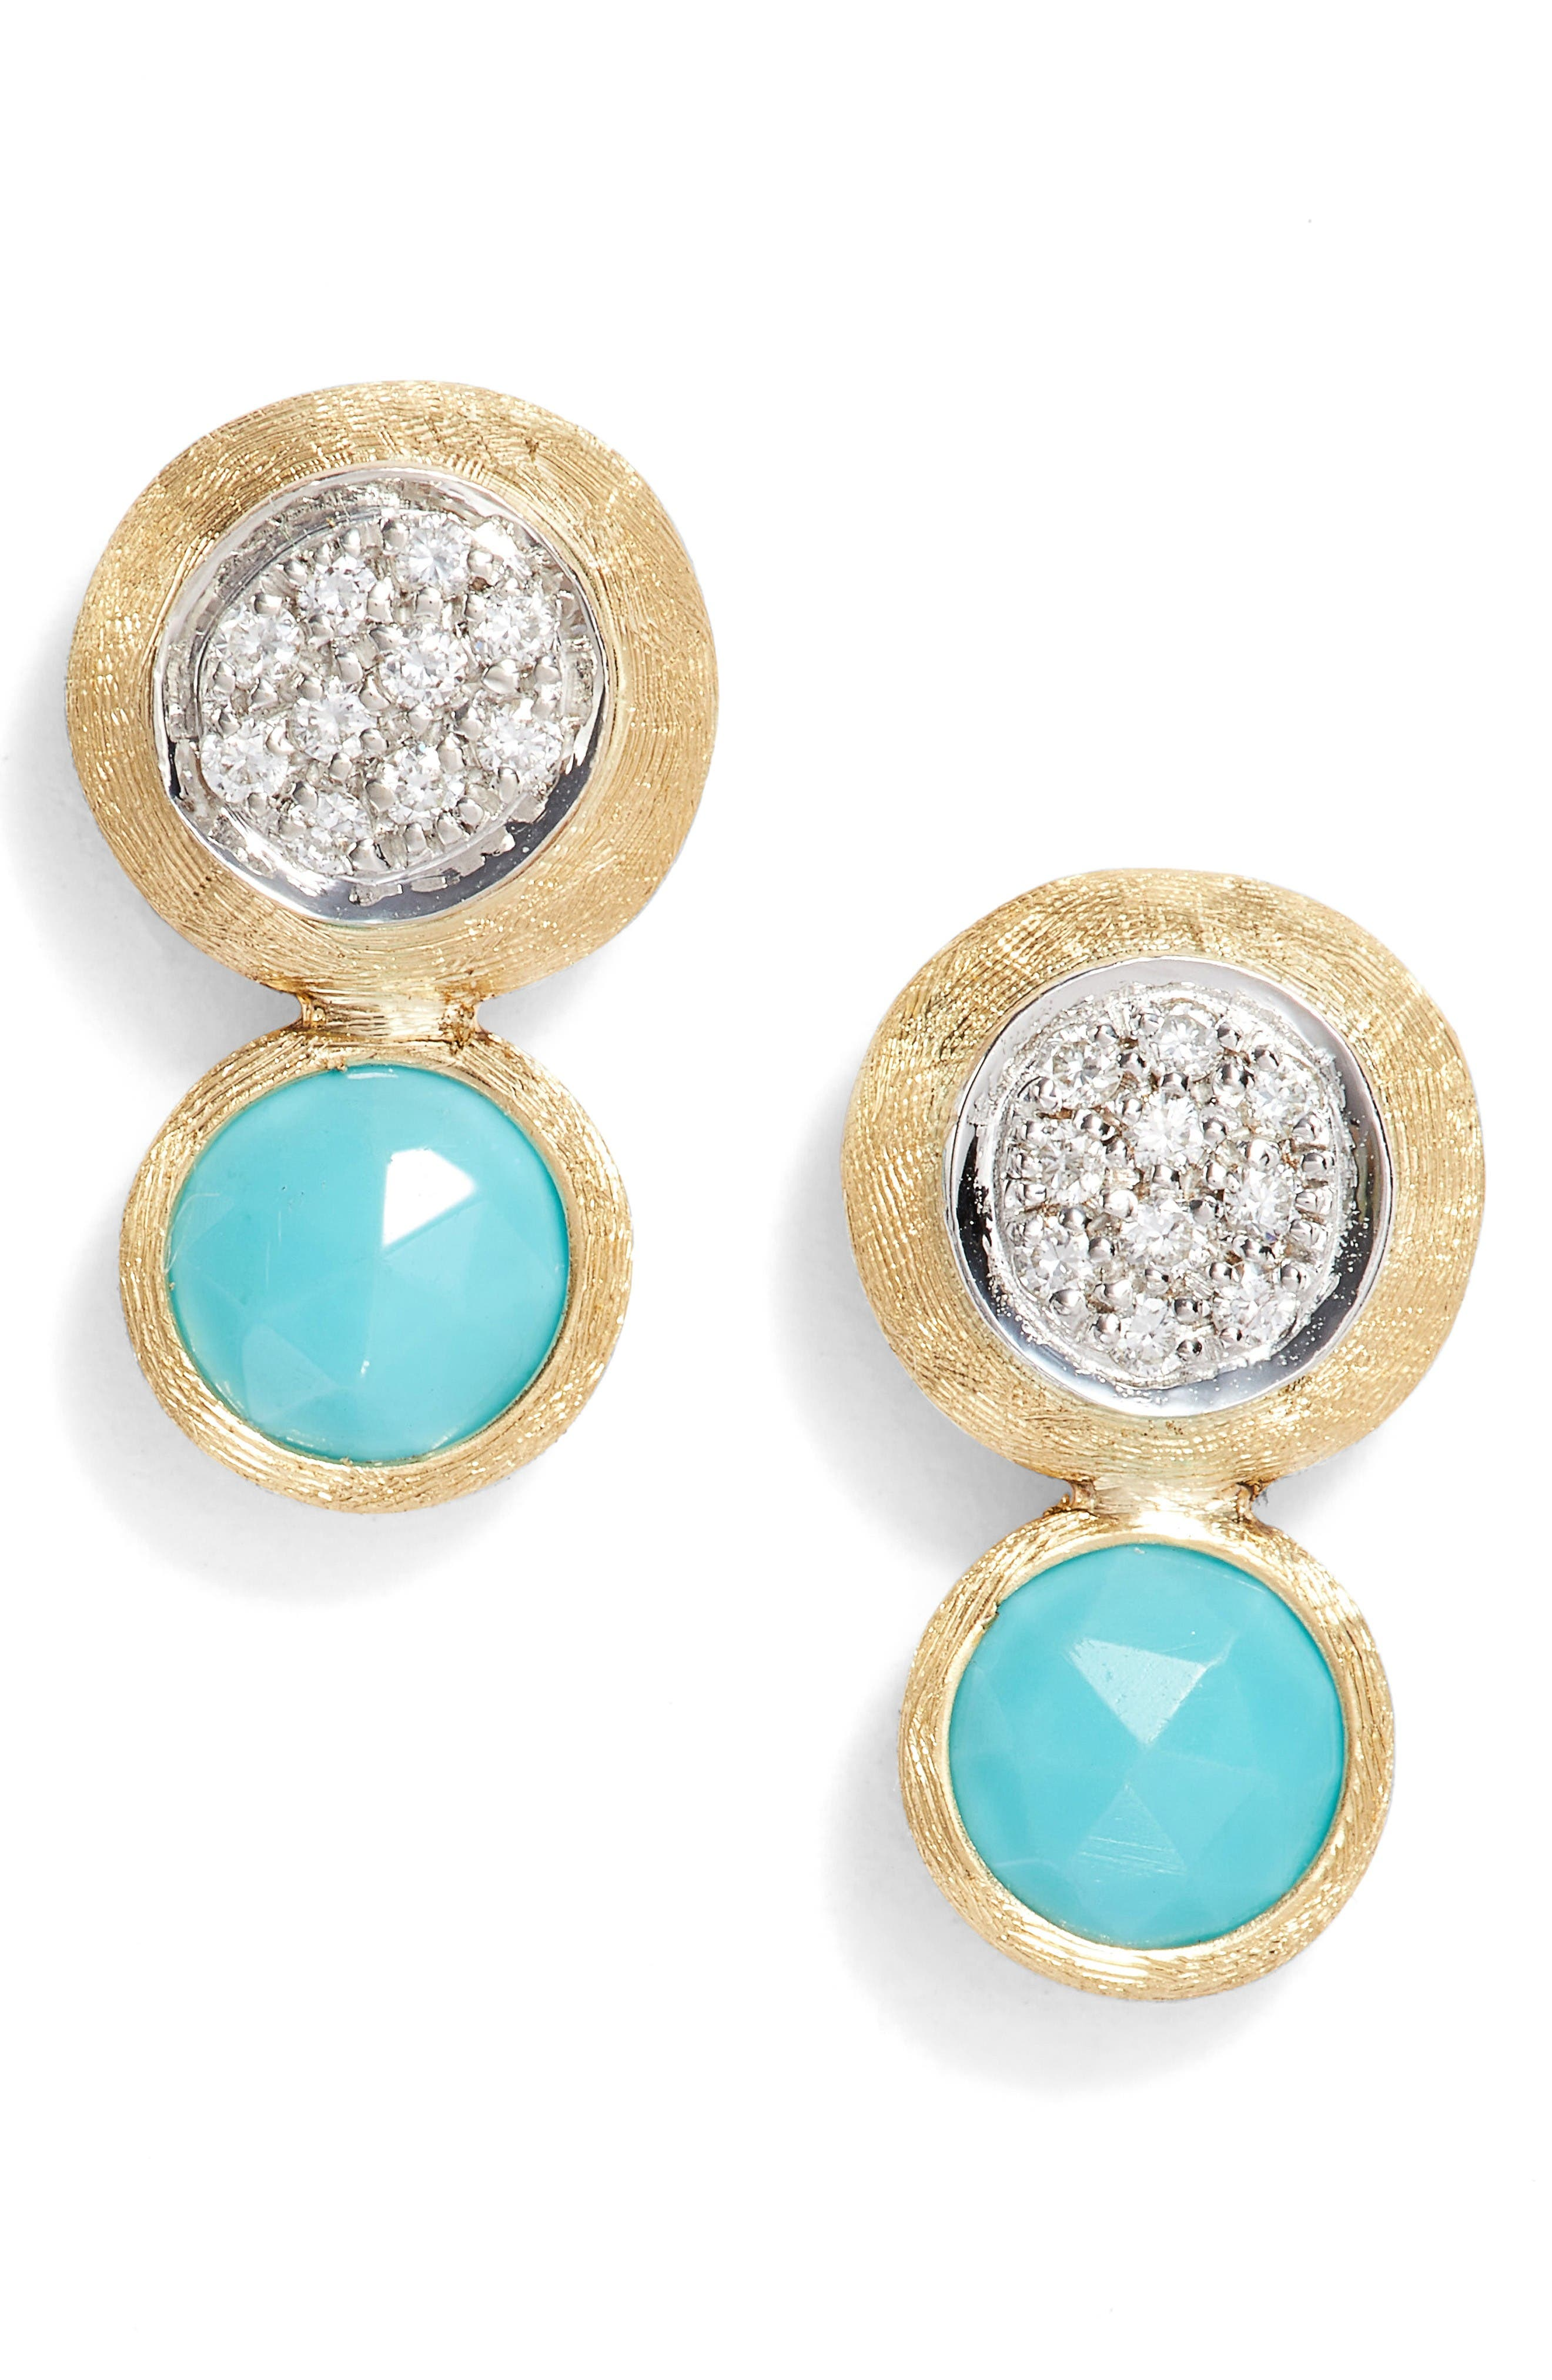 MARCO BICEGO Jaipur Diamond & Turquoise Stud Earrings